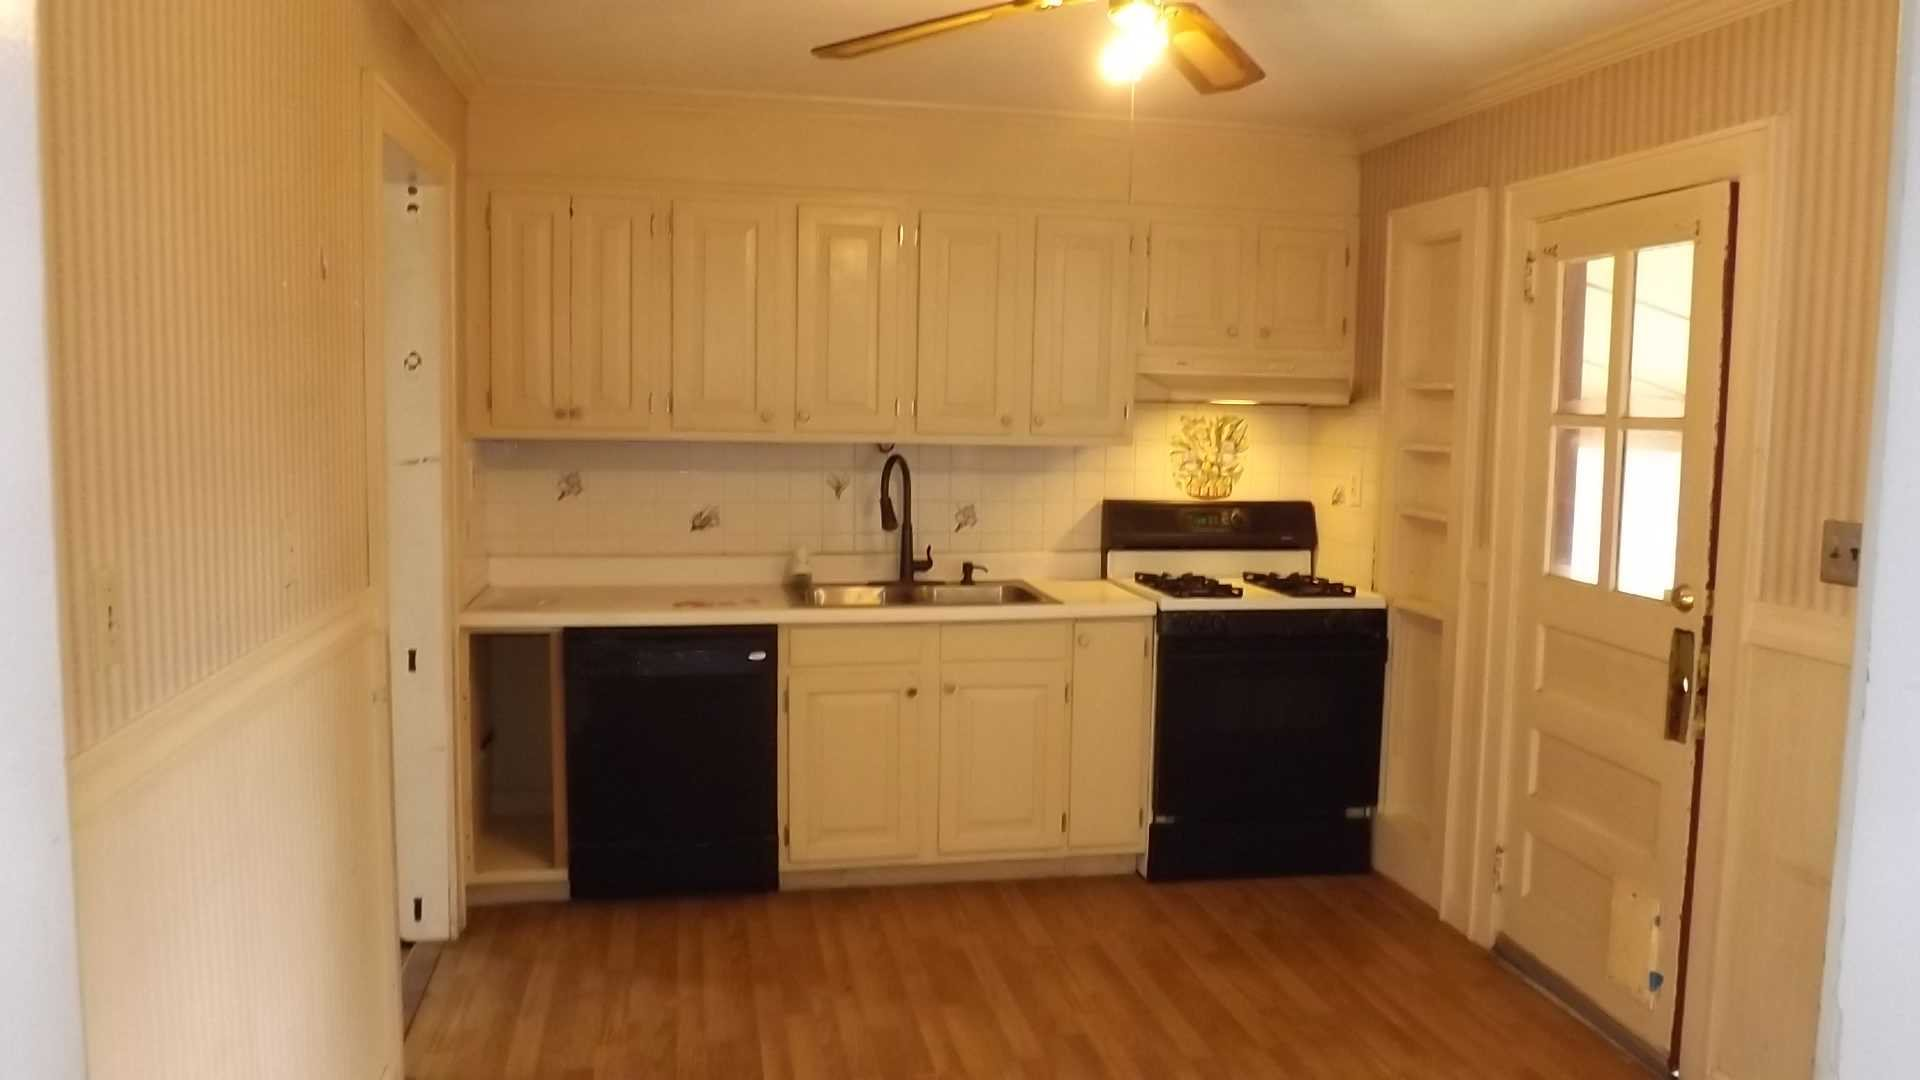 Single Family Home for Sale at 19 KILMER Avenue 19 KILMER Avenue Hyde Park, New York 12601 United States